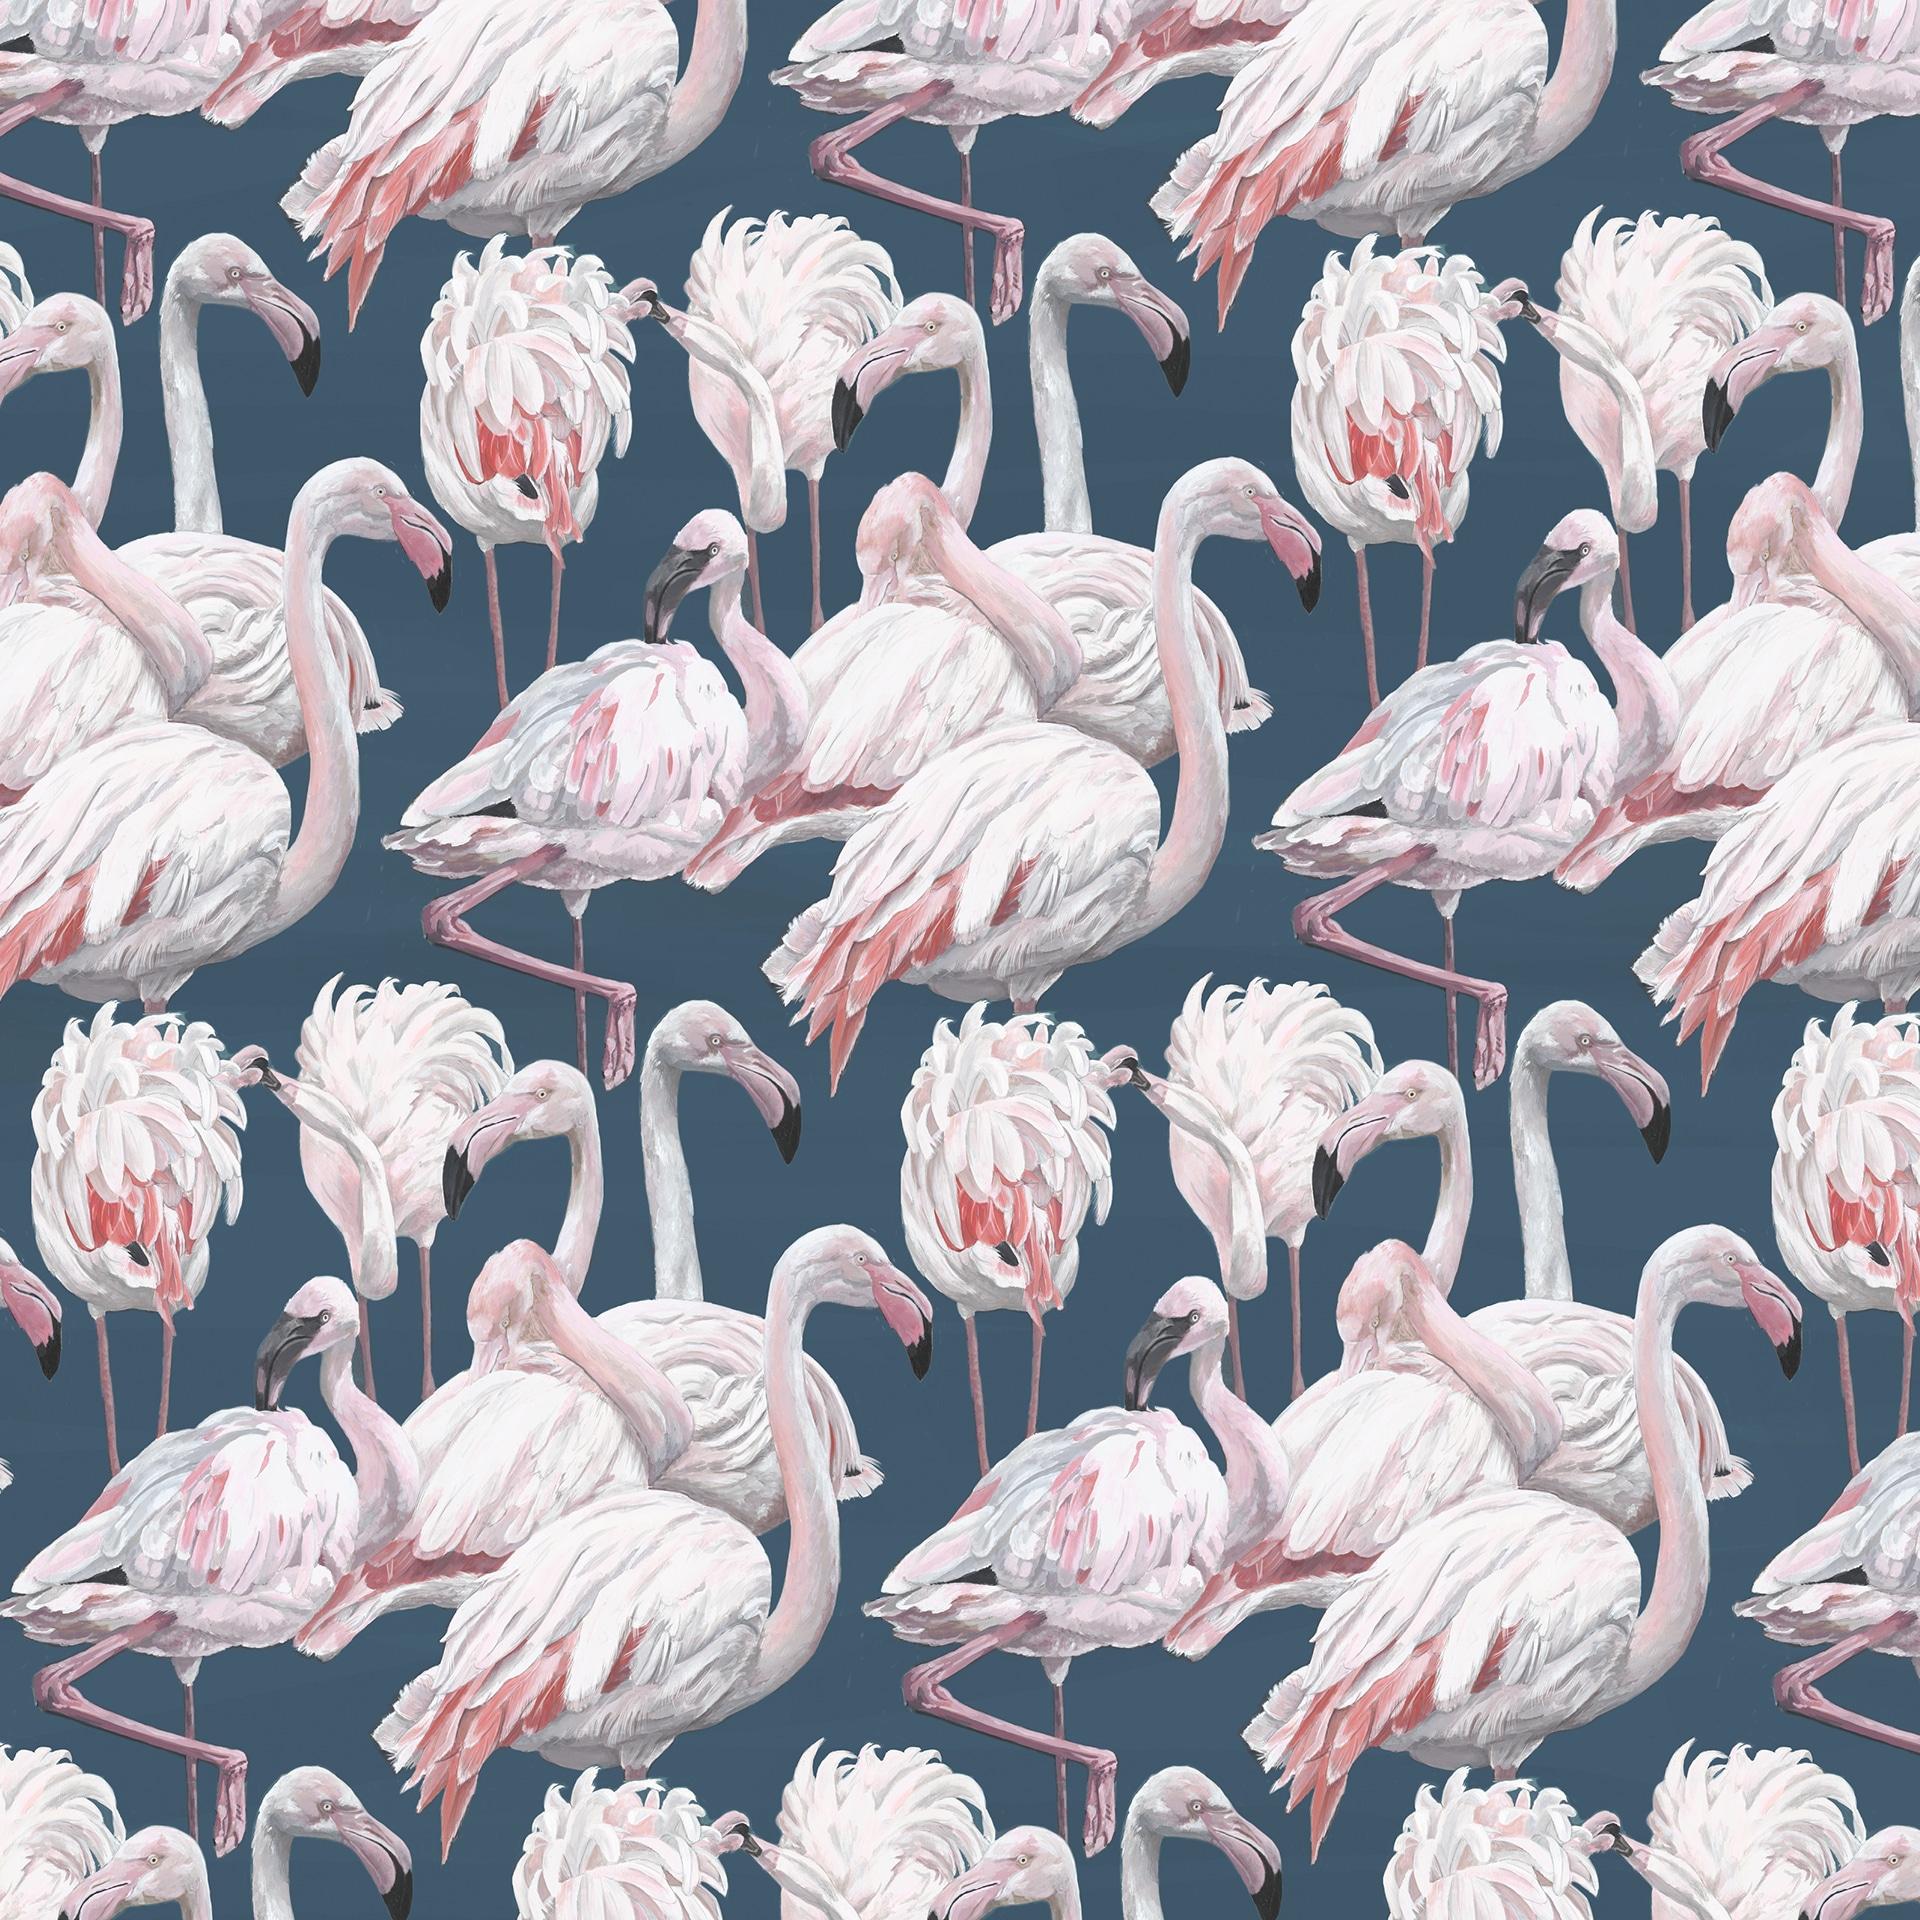 Flamingos-repeat-close